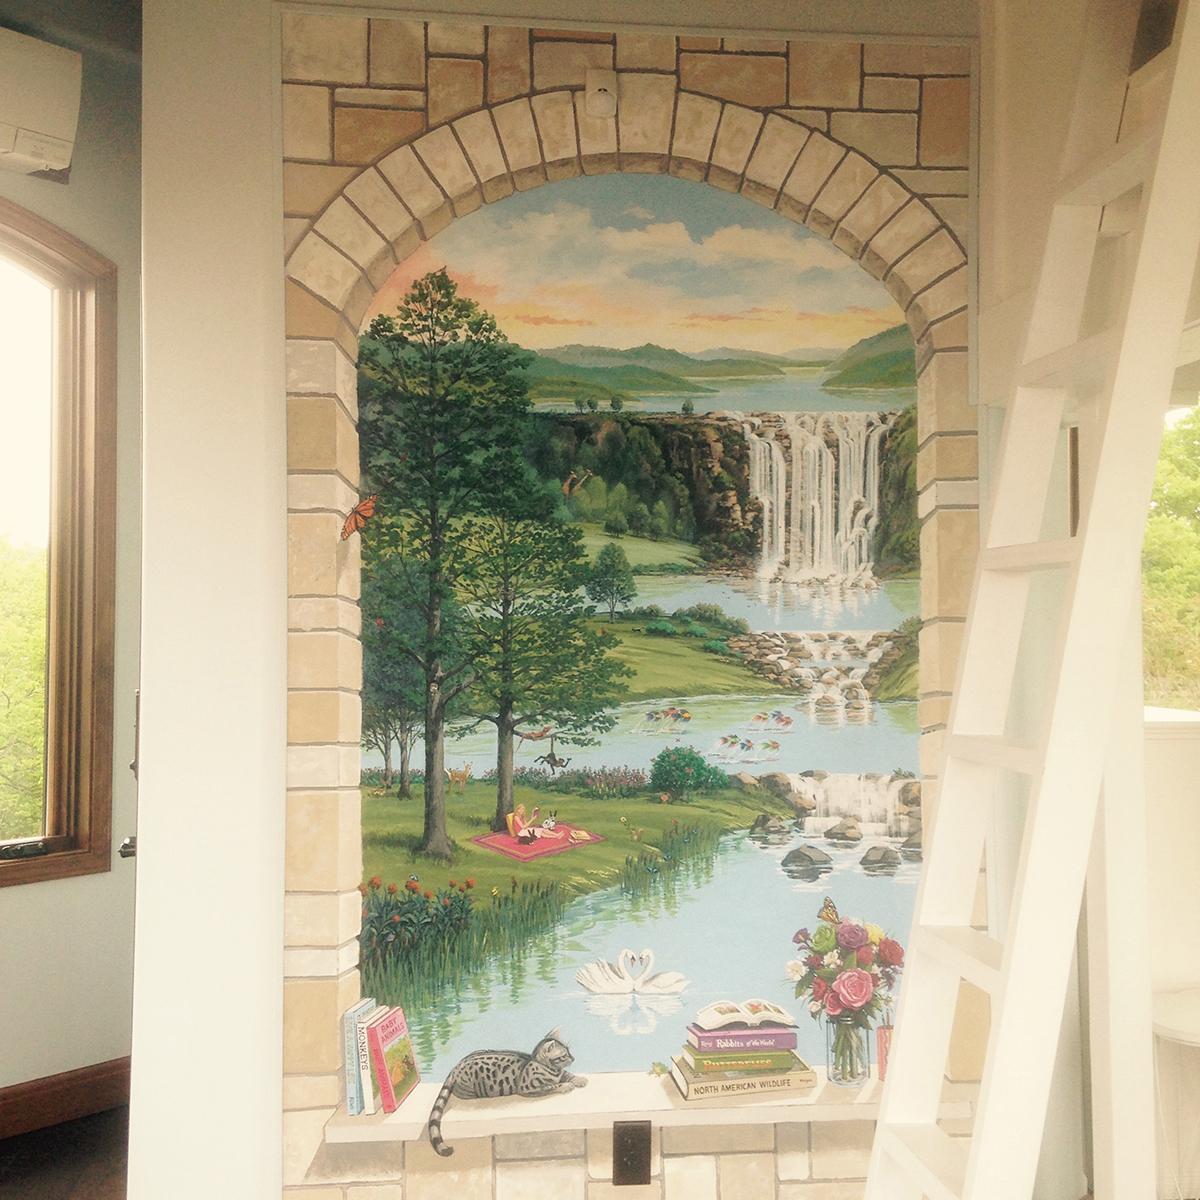 10-kaseys-treehouse-mural